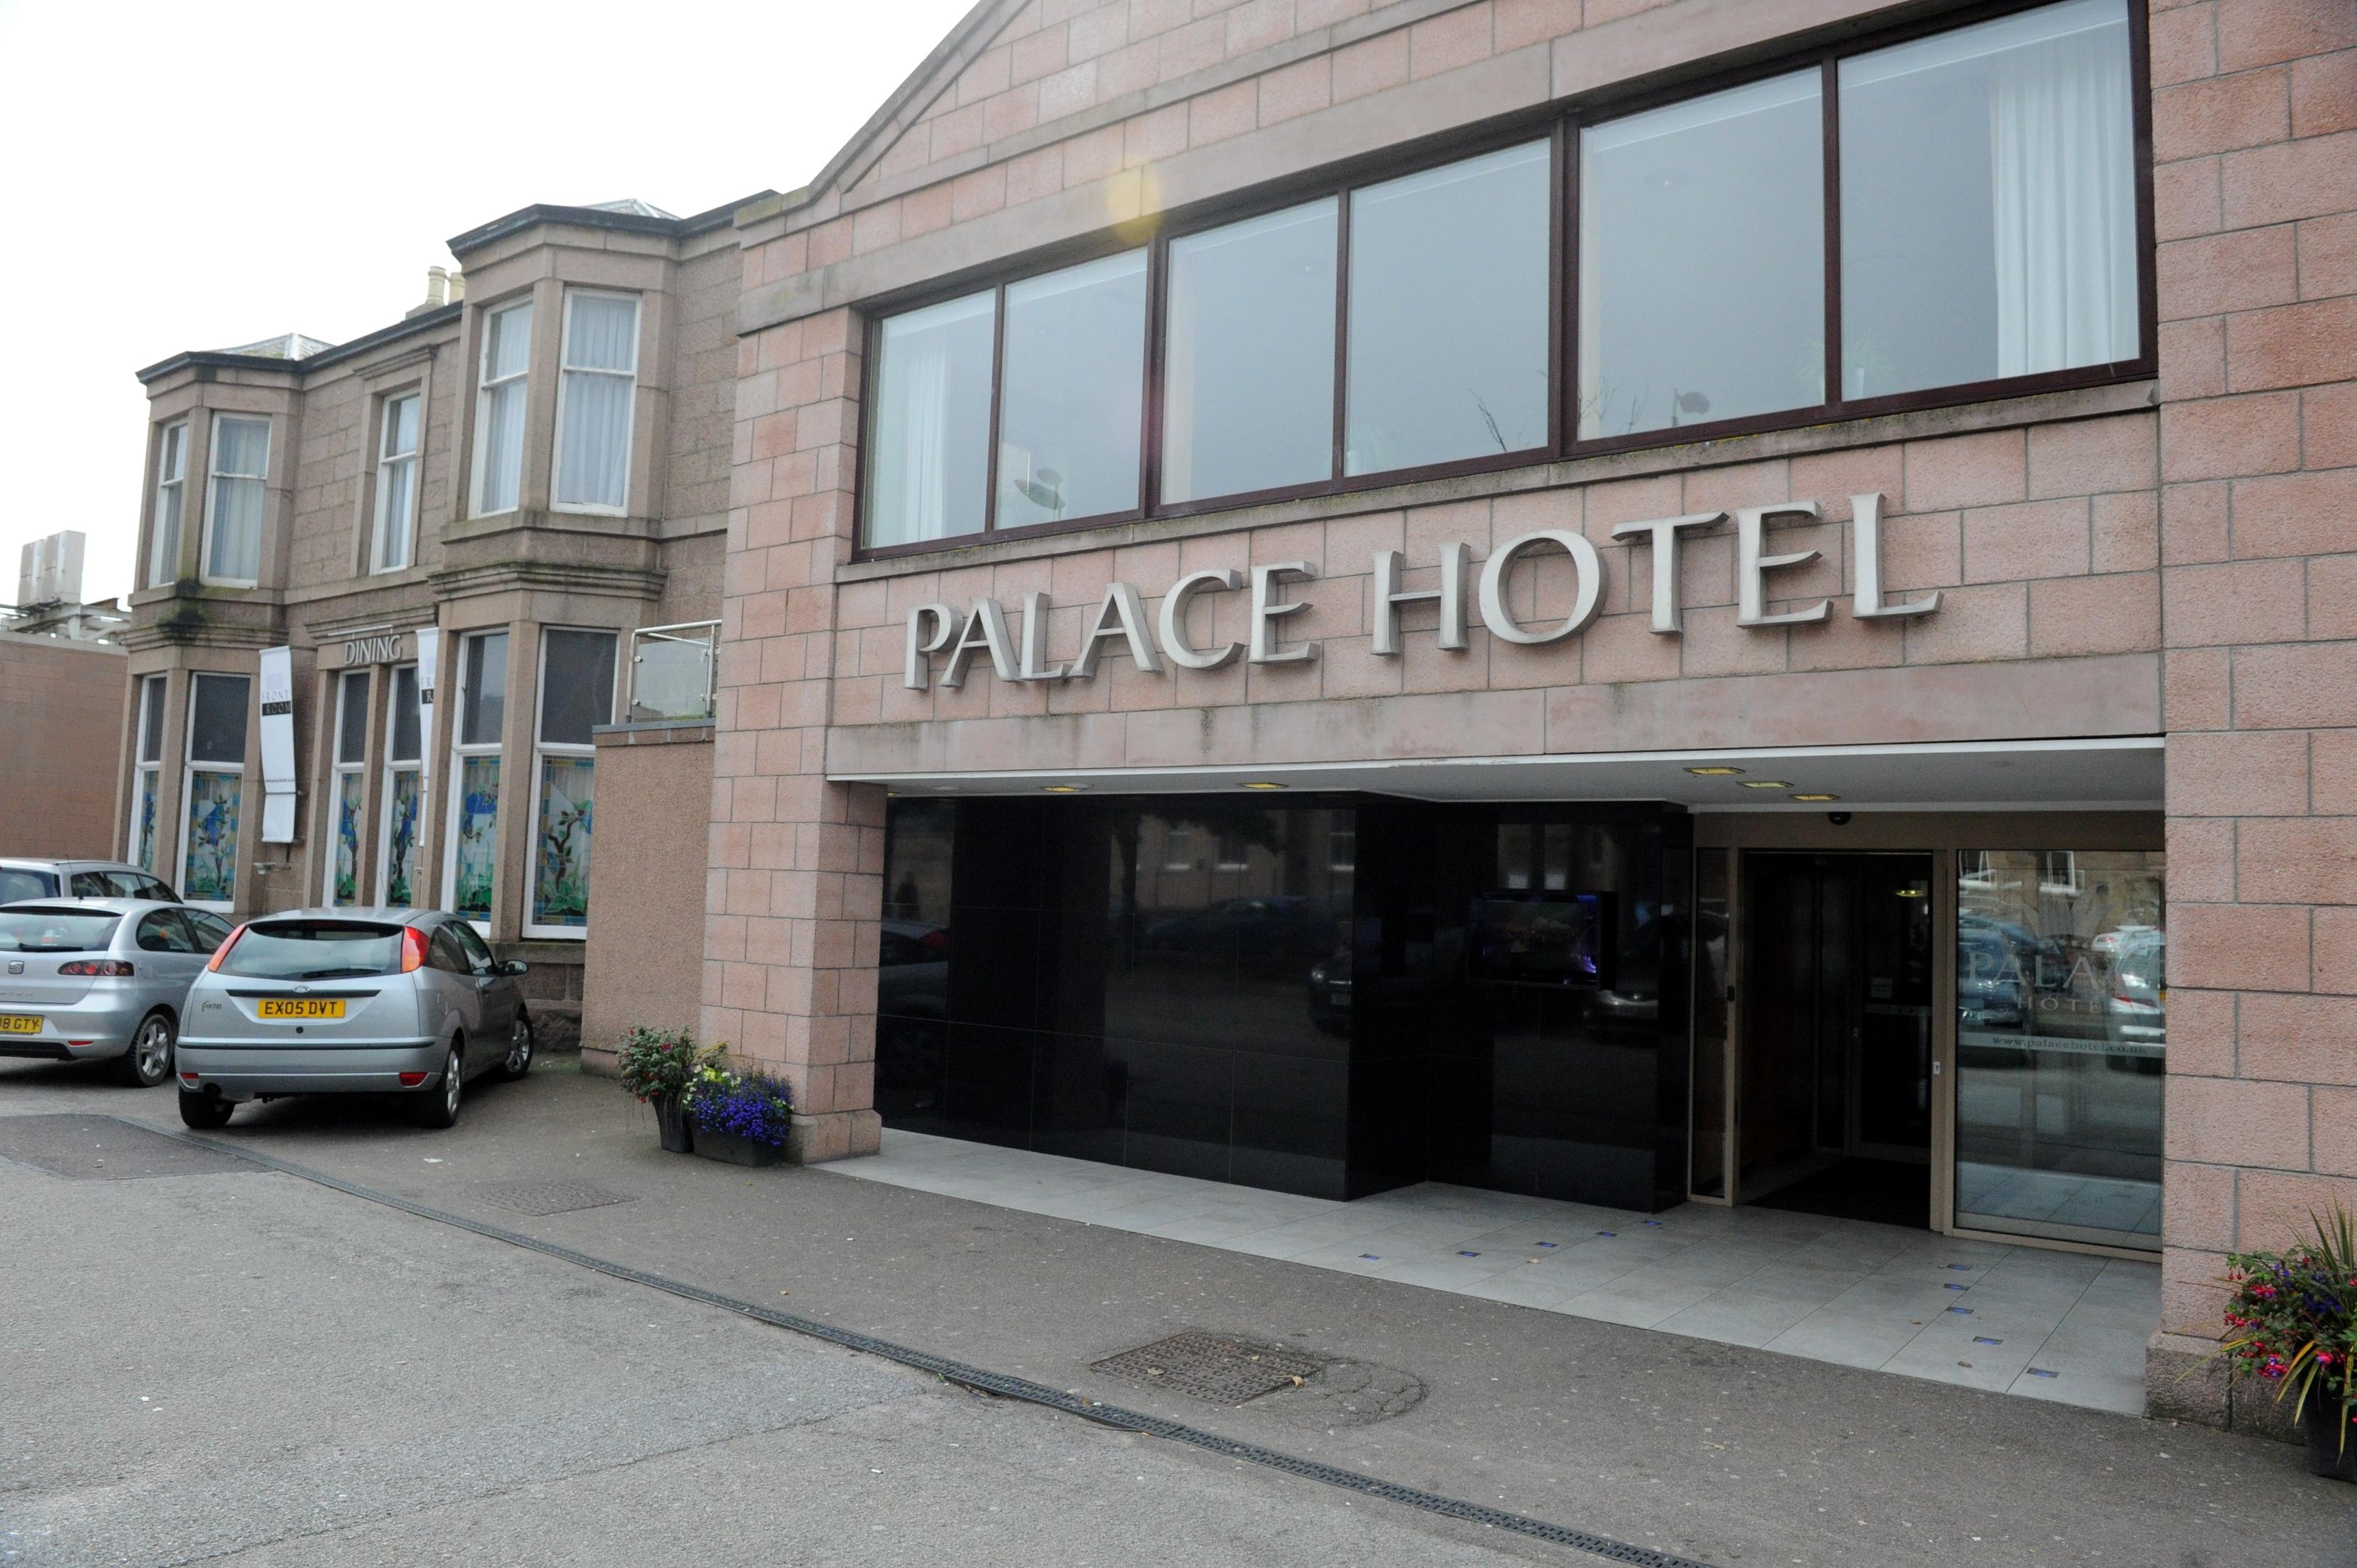 The Palace Hotel, Peterhead